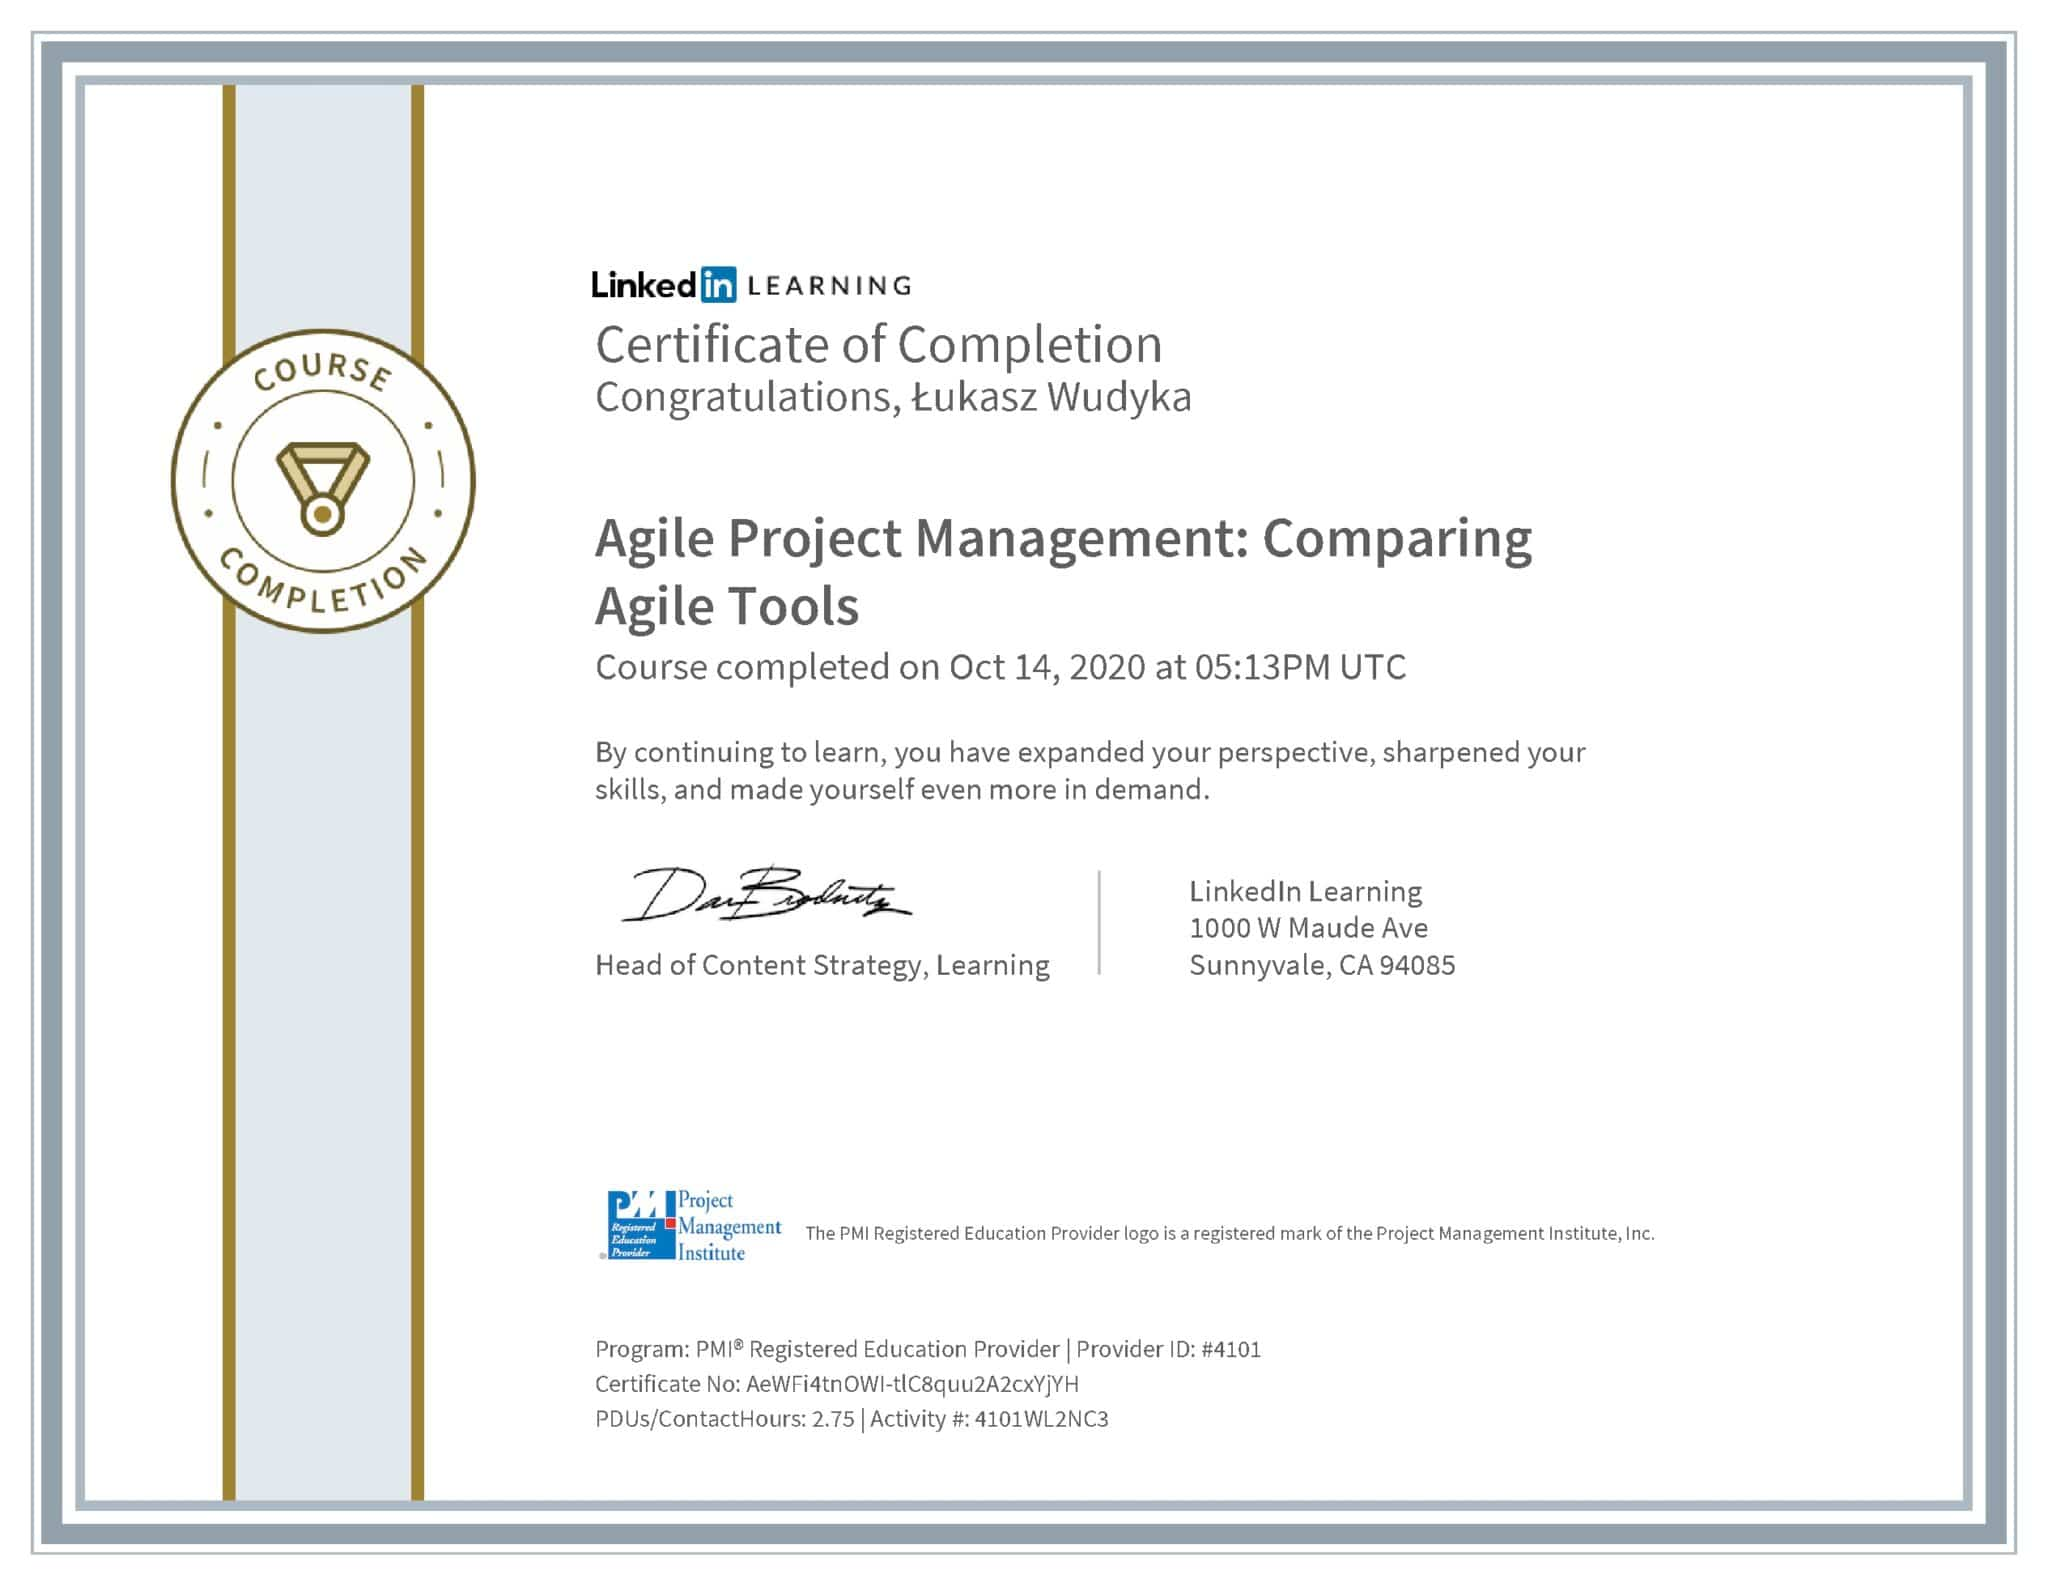 Łukasz Wudyka certyfikat LinkedIn Agile Project Management: Comparing Agile Tools PMI